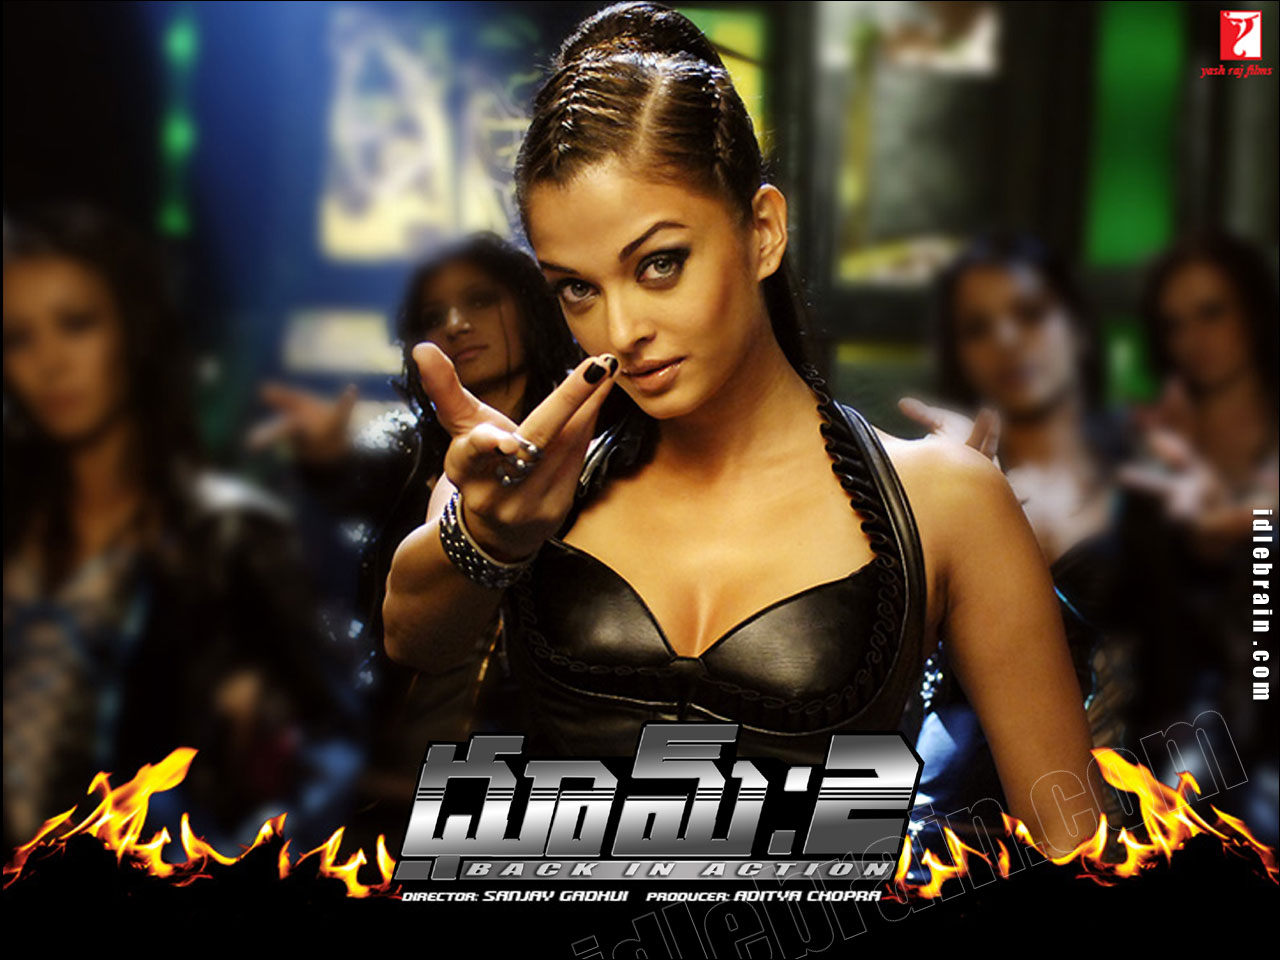 Dhoom 2   Telugu film wallpapers   Telugu cinema   Hrithik Roshan 1280x960